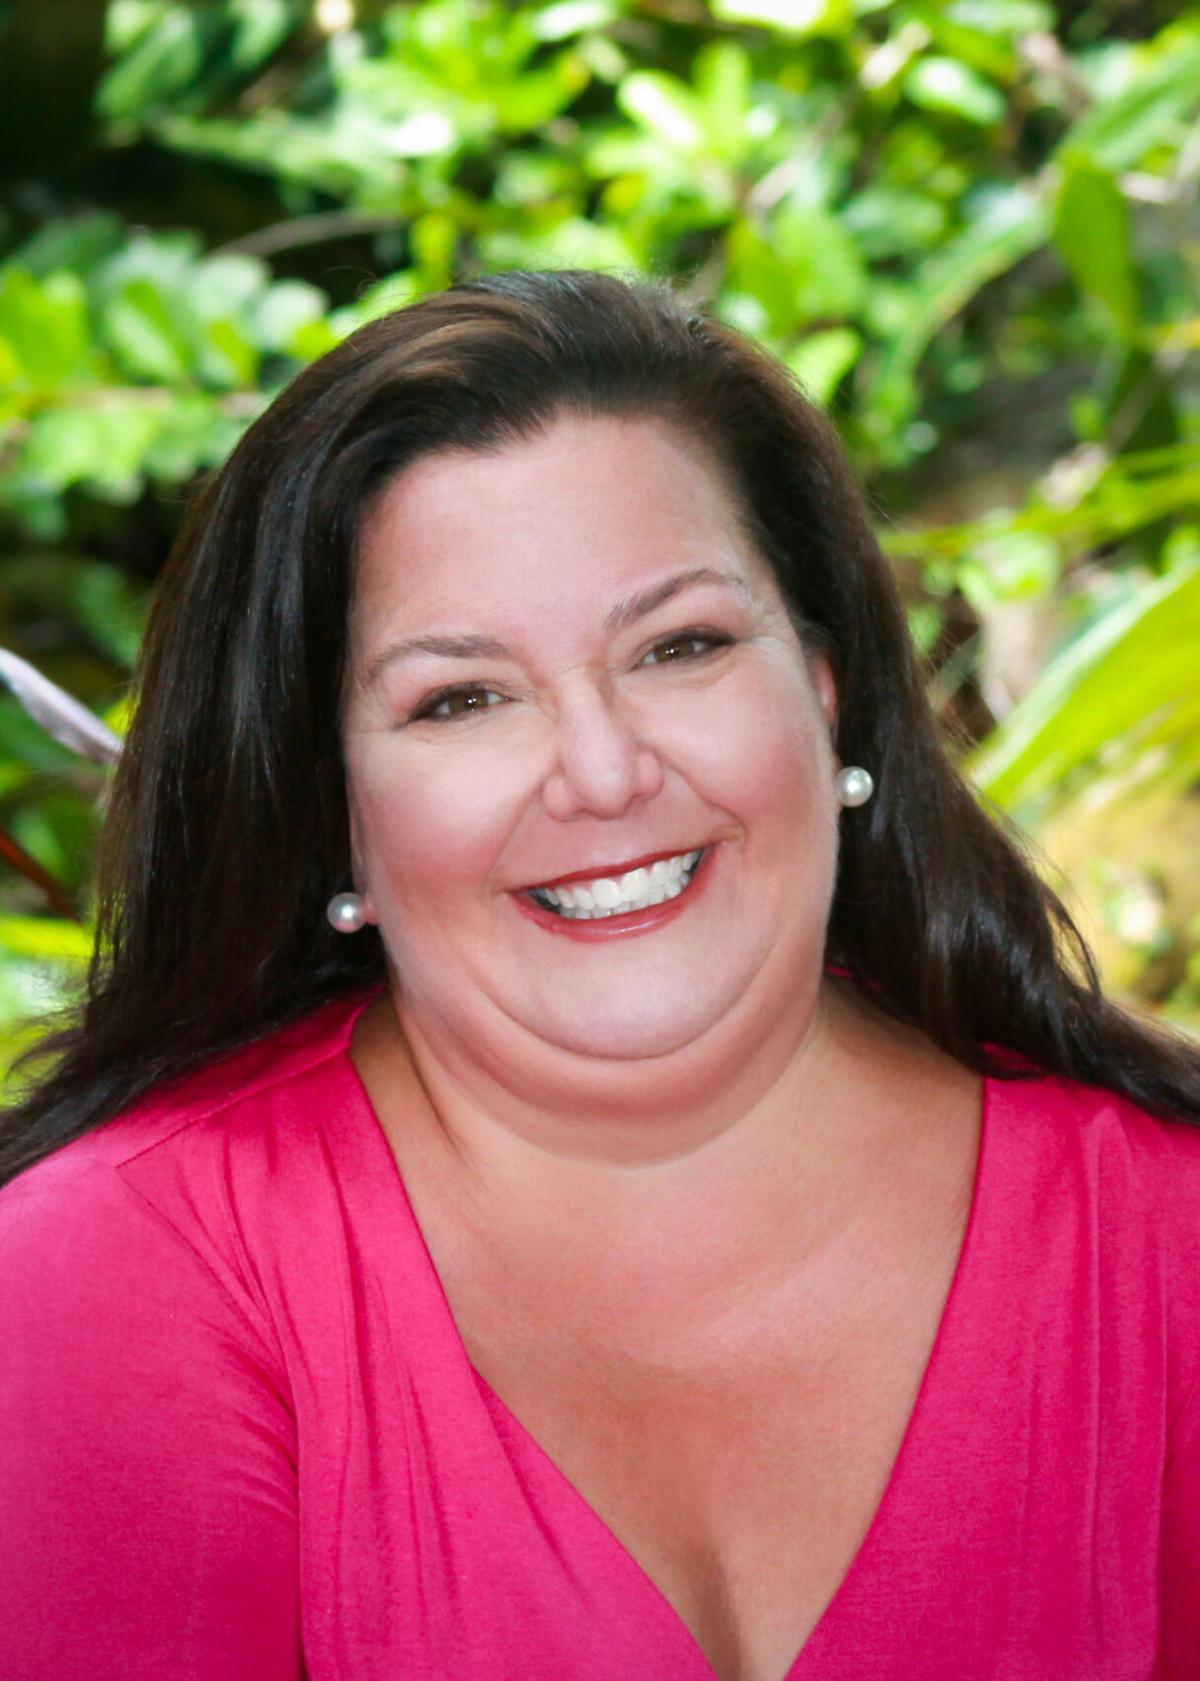 Council Member Allison McCormick